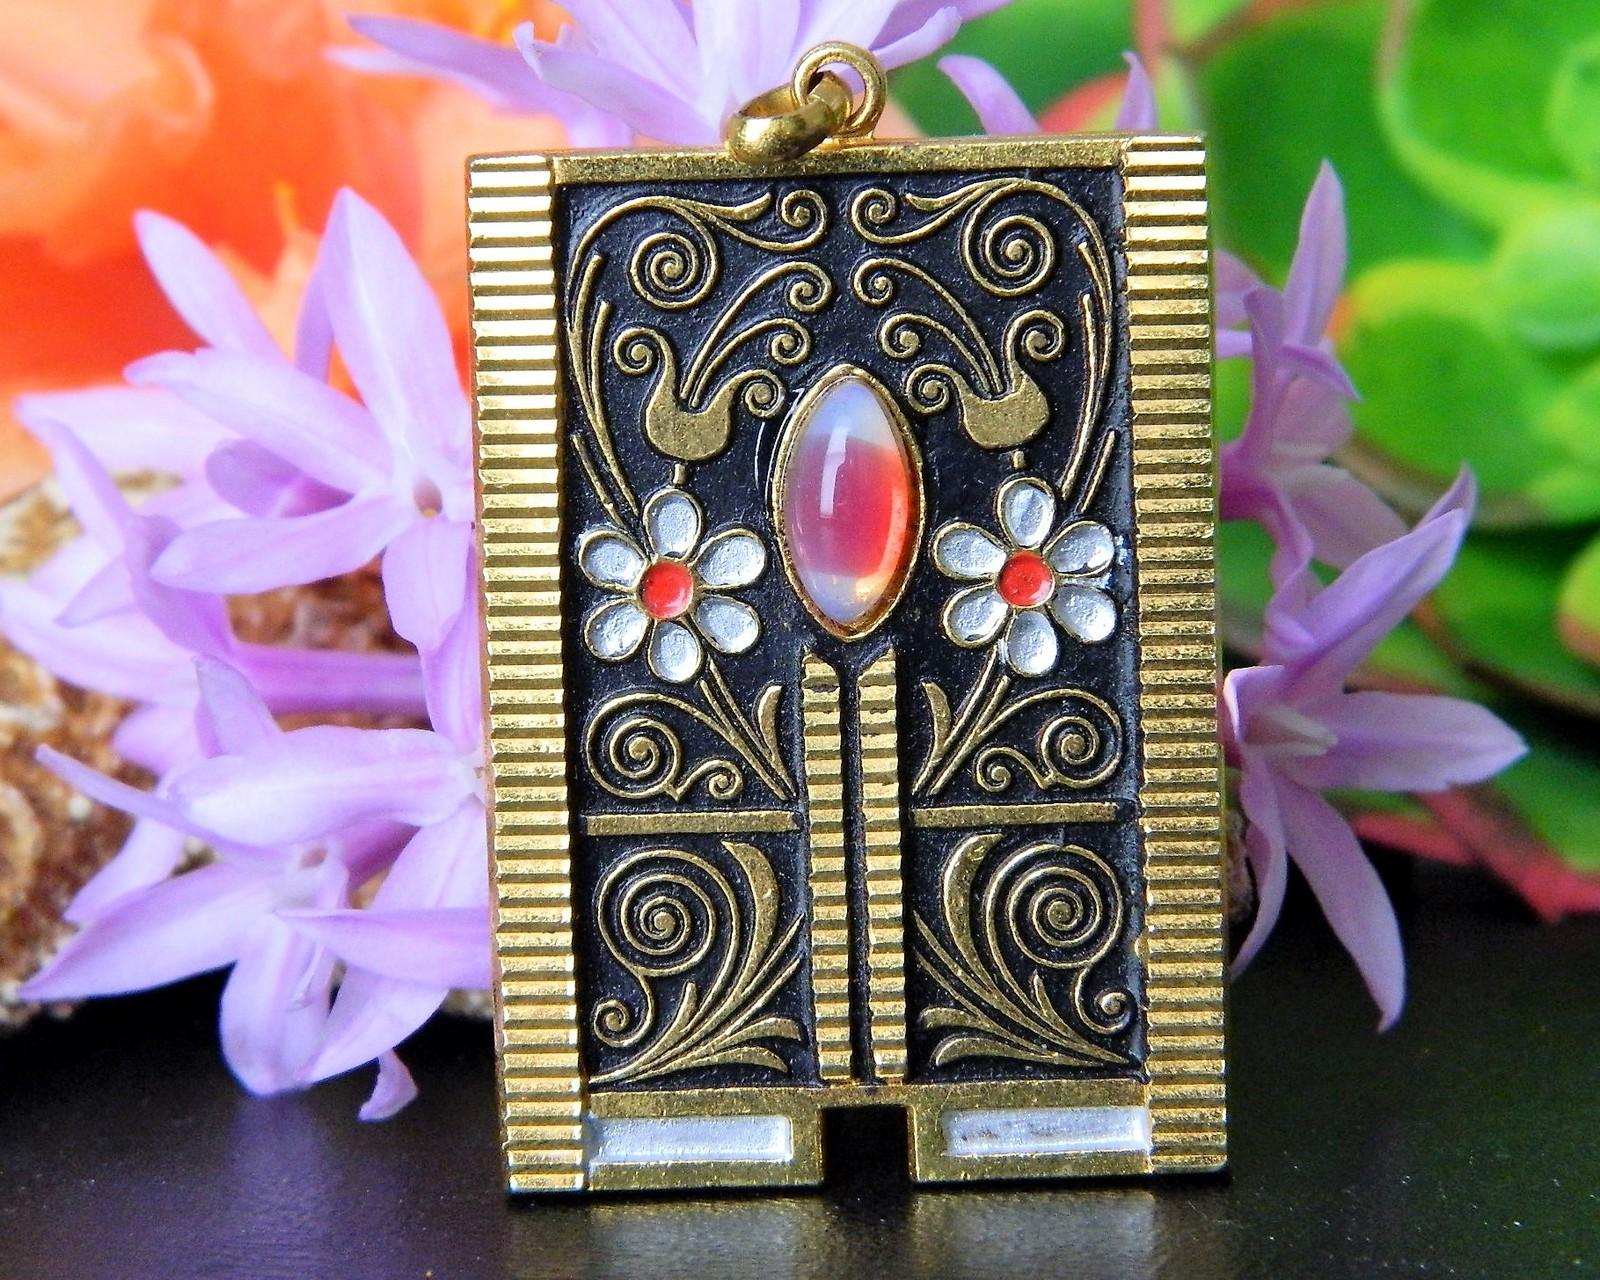 Vintage Damascene Style Pendant Daisies Flowers Moonstone Gold Black